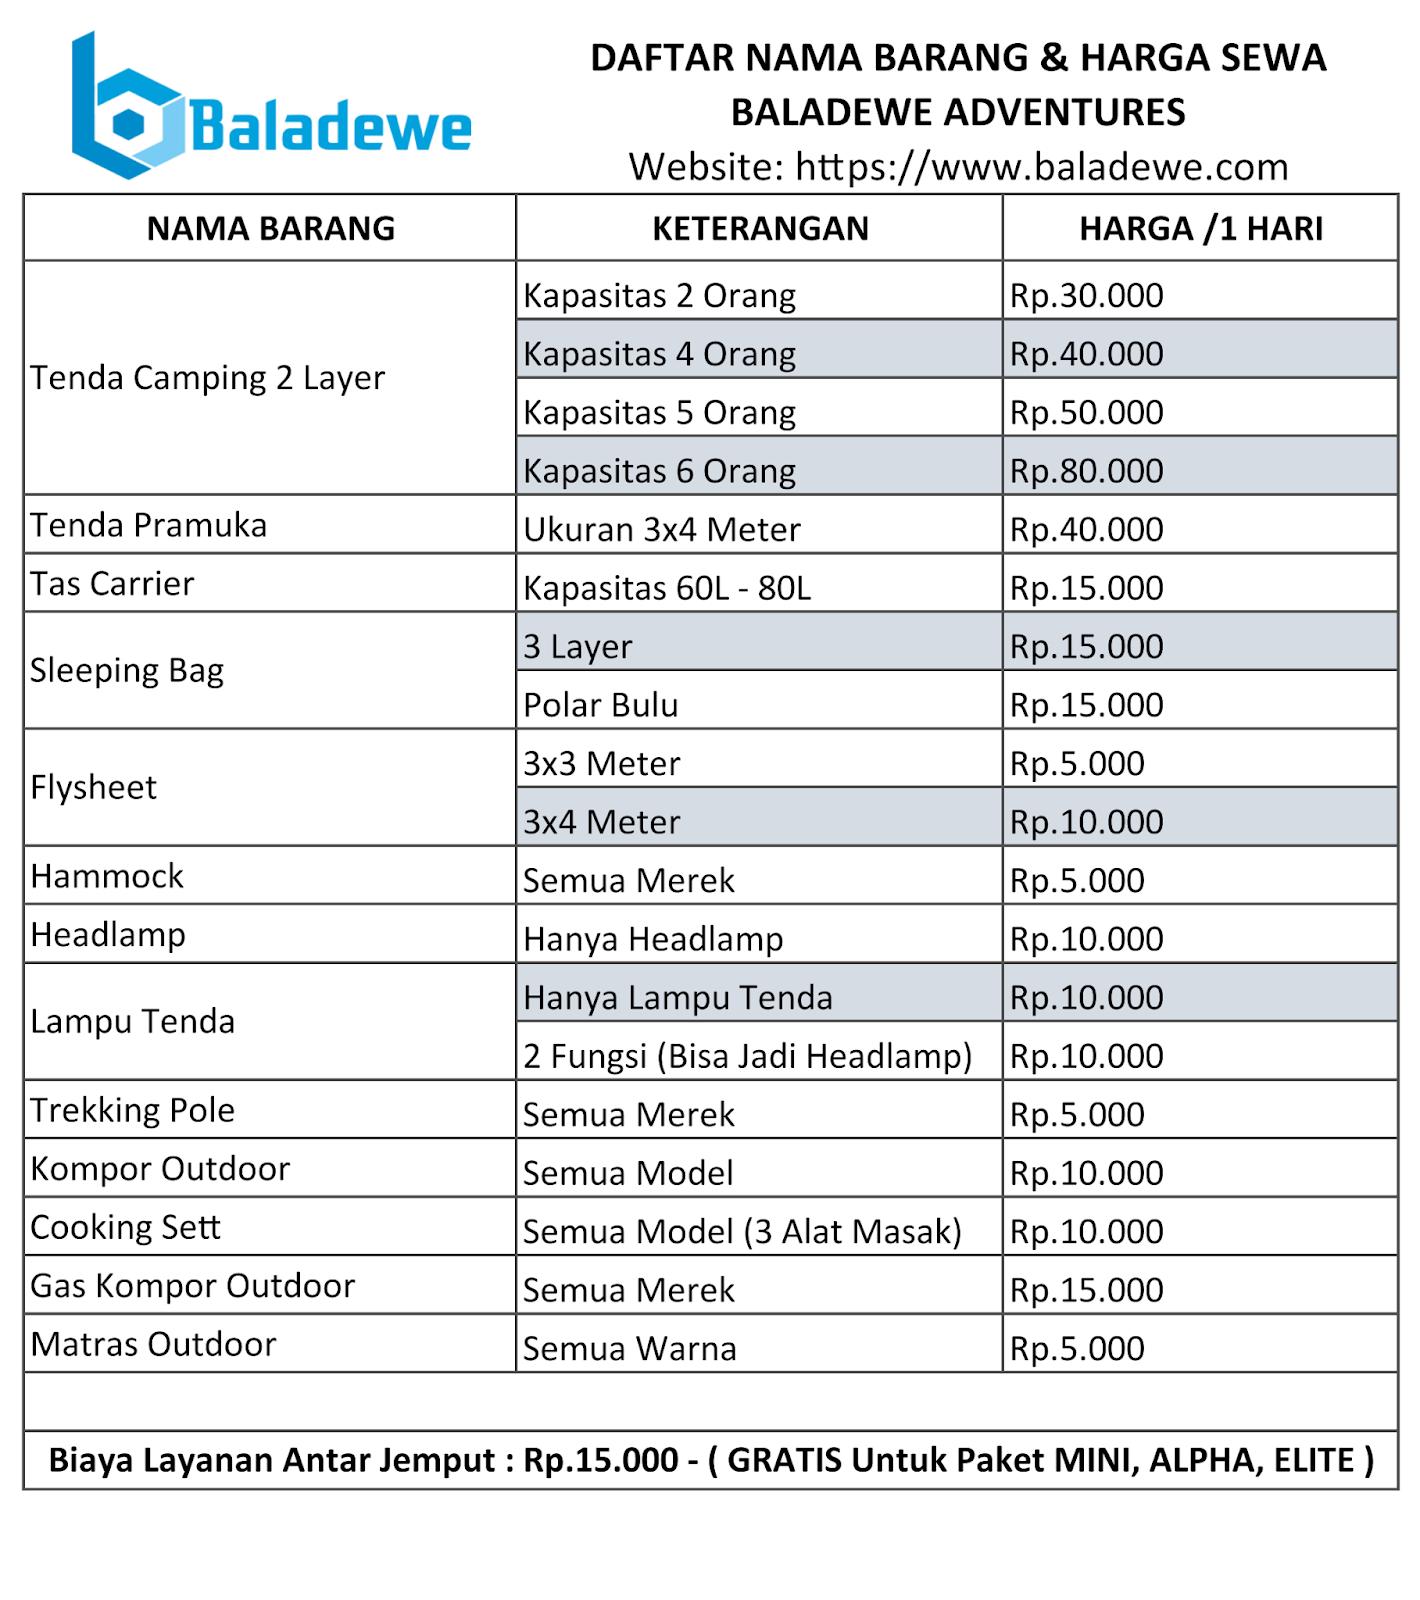 Daftar Harga Sewa Baladewe Adventures Baladewe Adventure